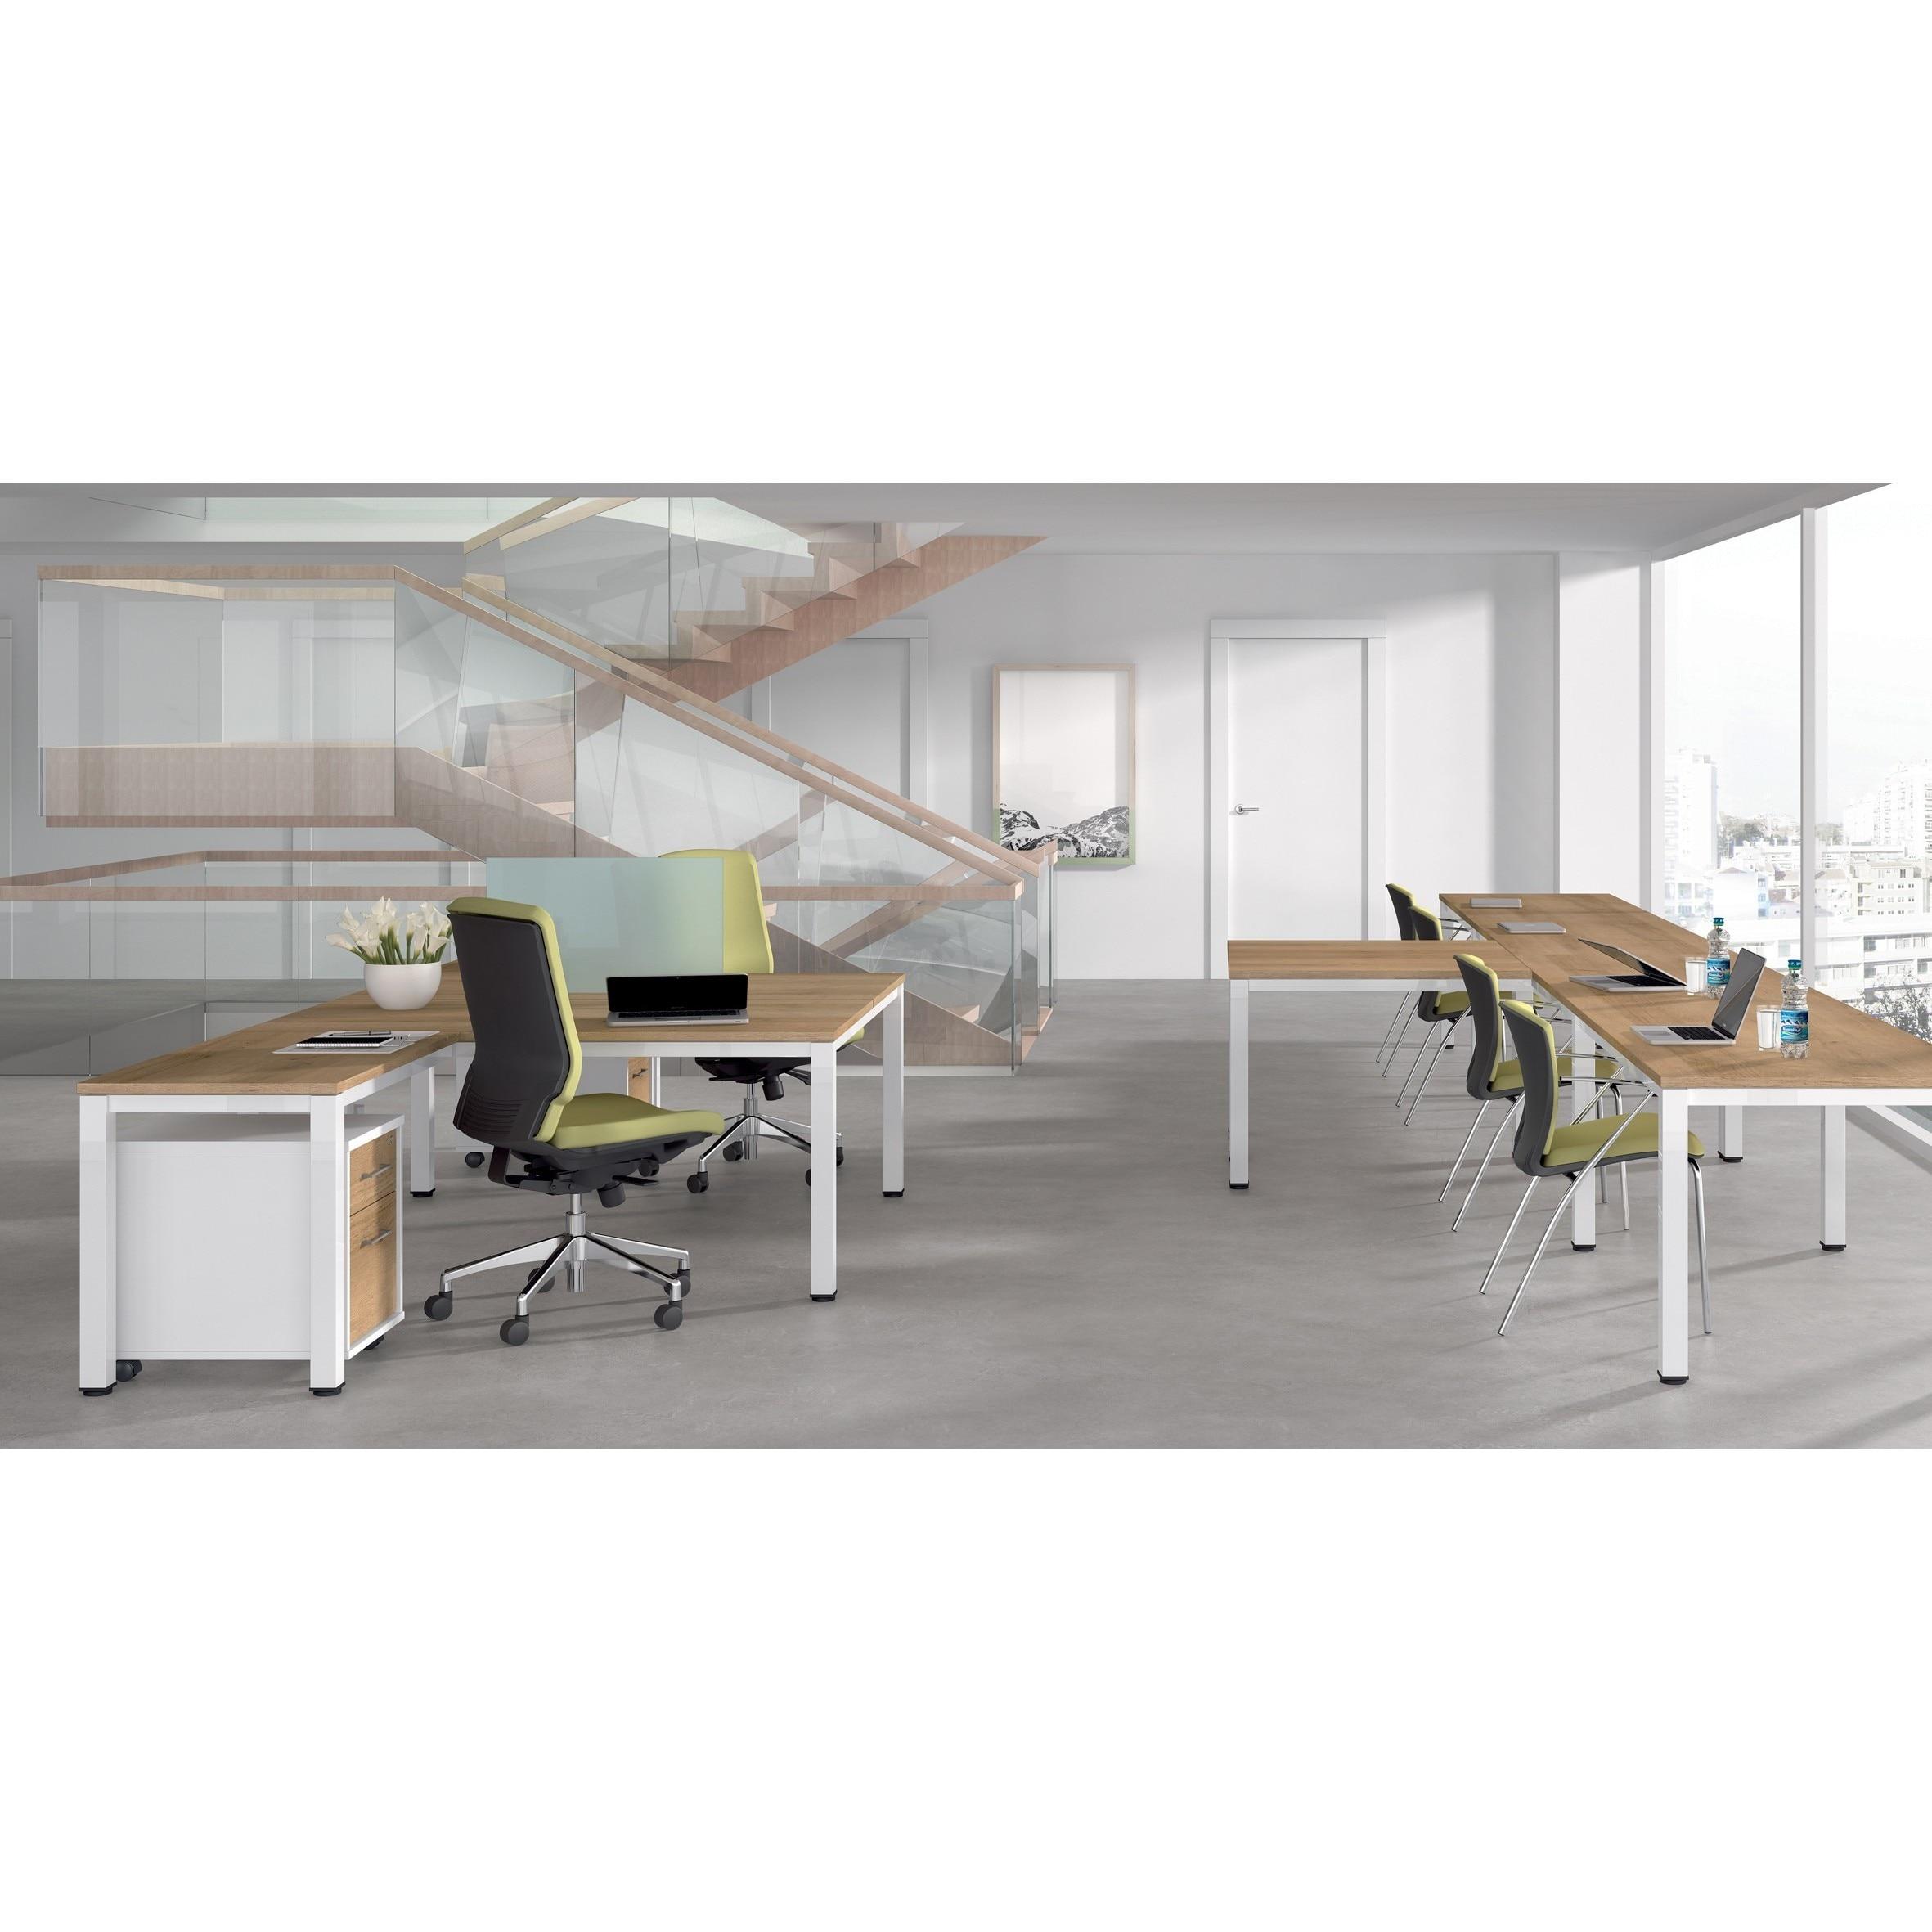 TABLE OFFICE 'S EXECUTIVE SERIES 200X100 CHROME/GREY